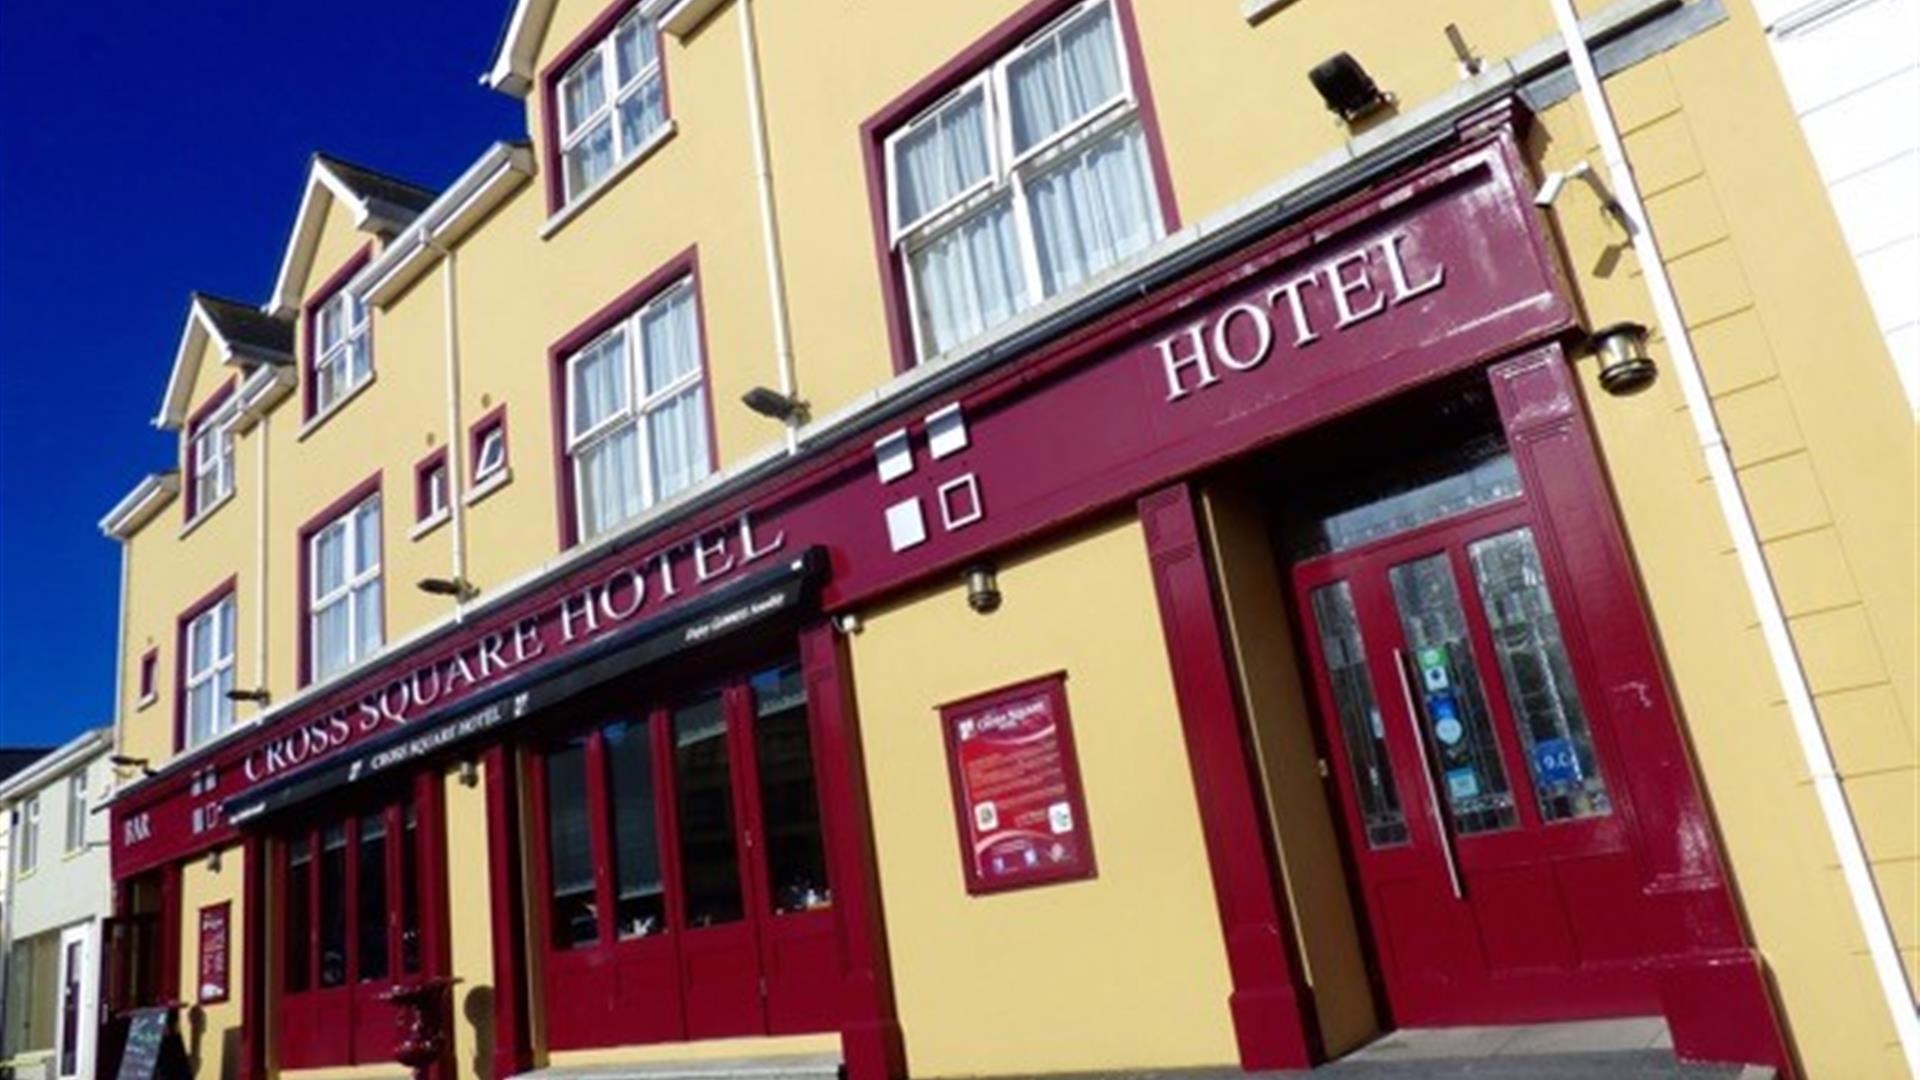 The Cross Square Hotel